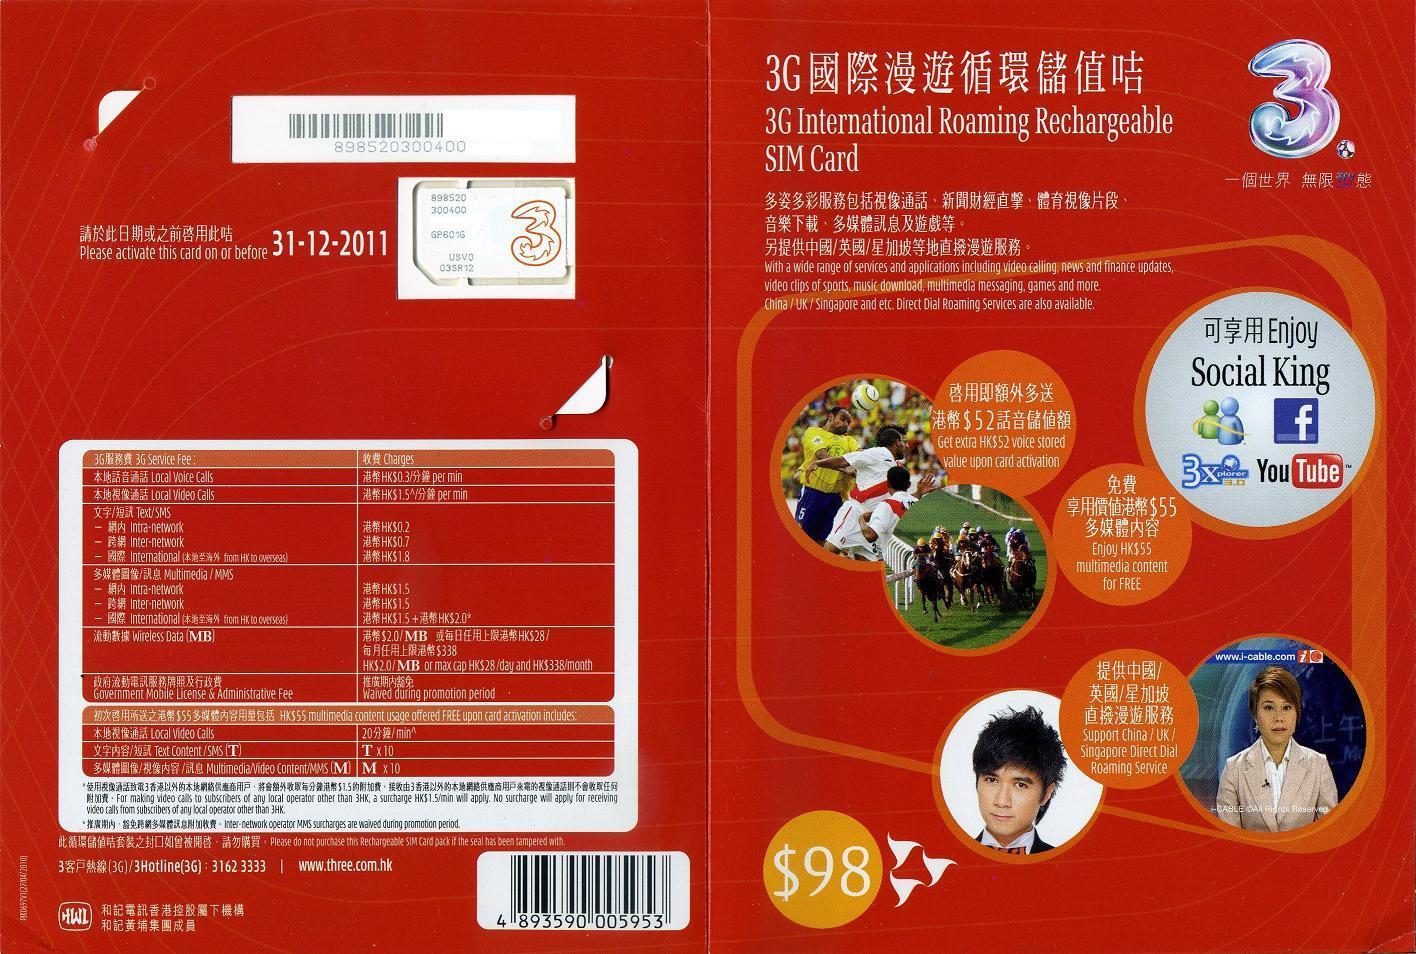 3HK 3G Int'l Roaming Rechargeable SIM